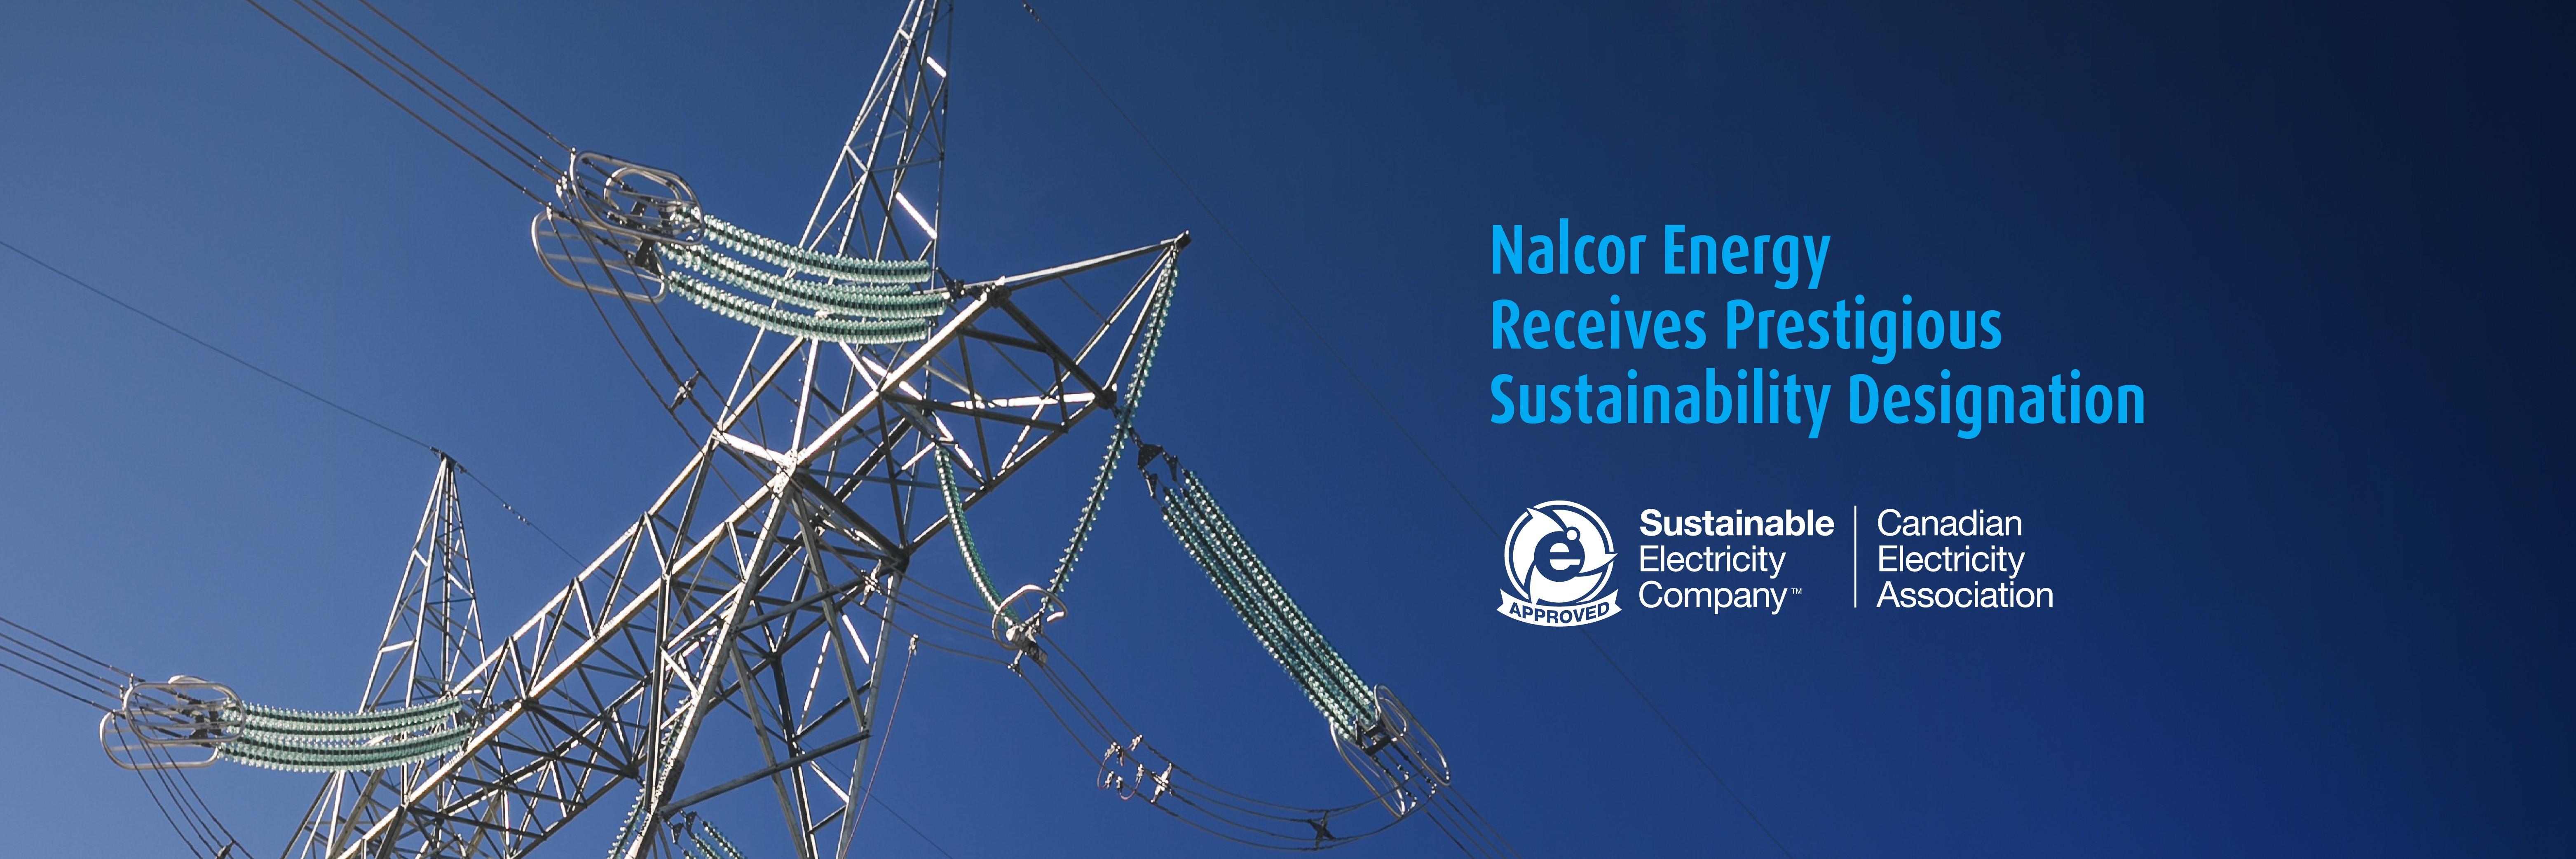 Nalcor Energy | LinkedIn